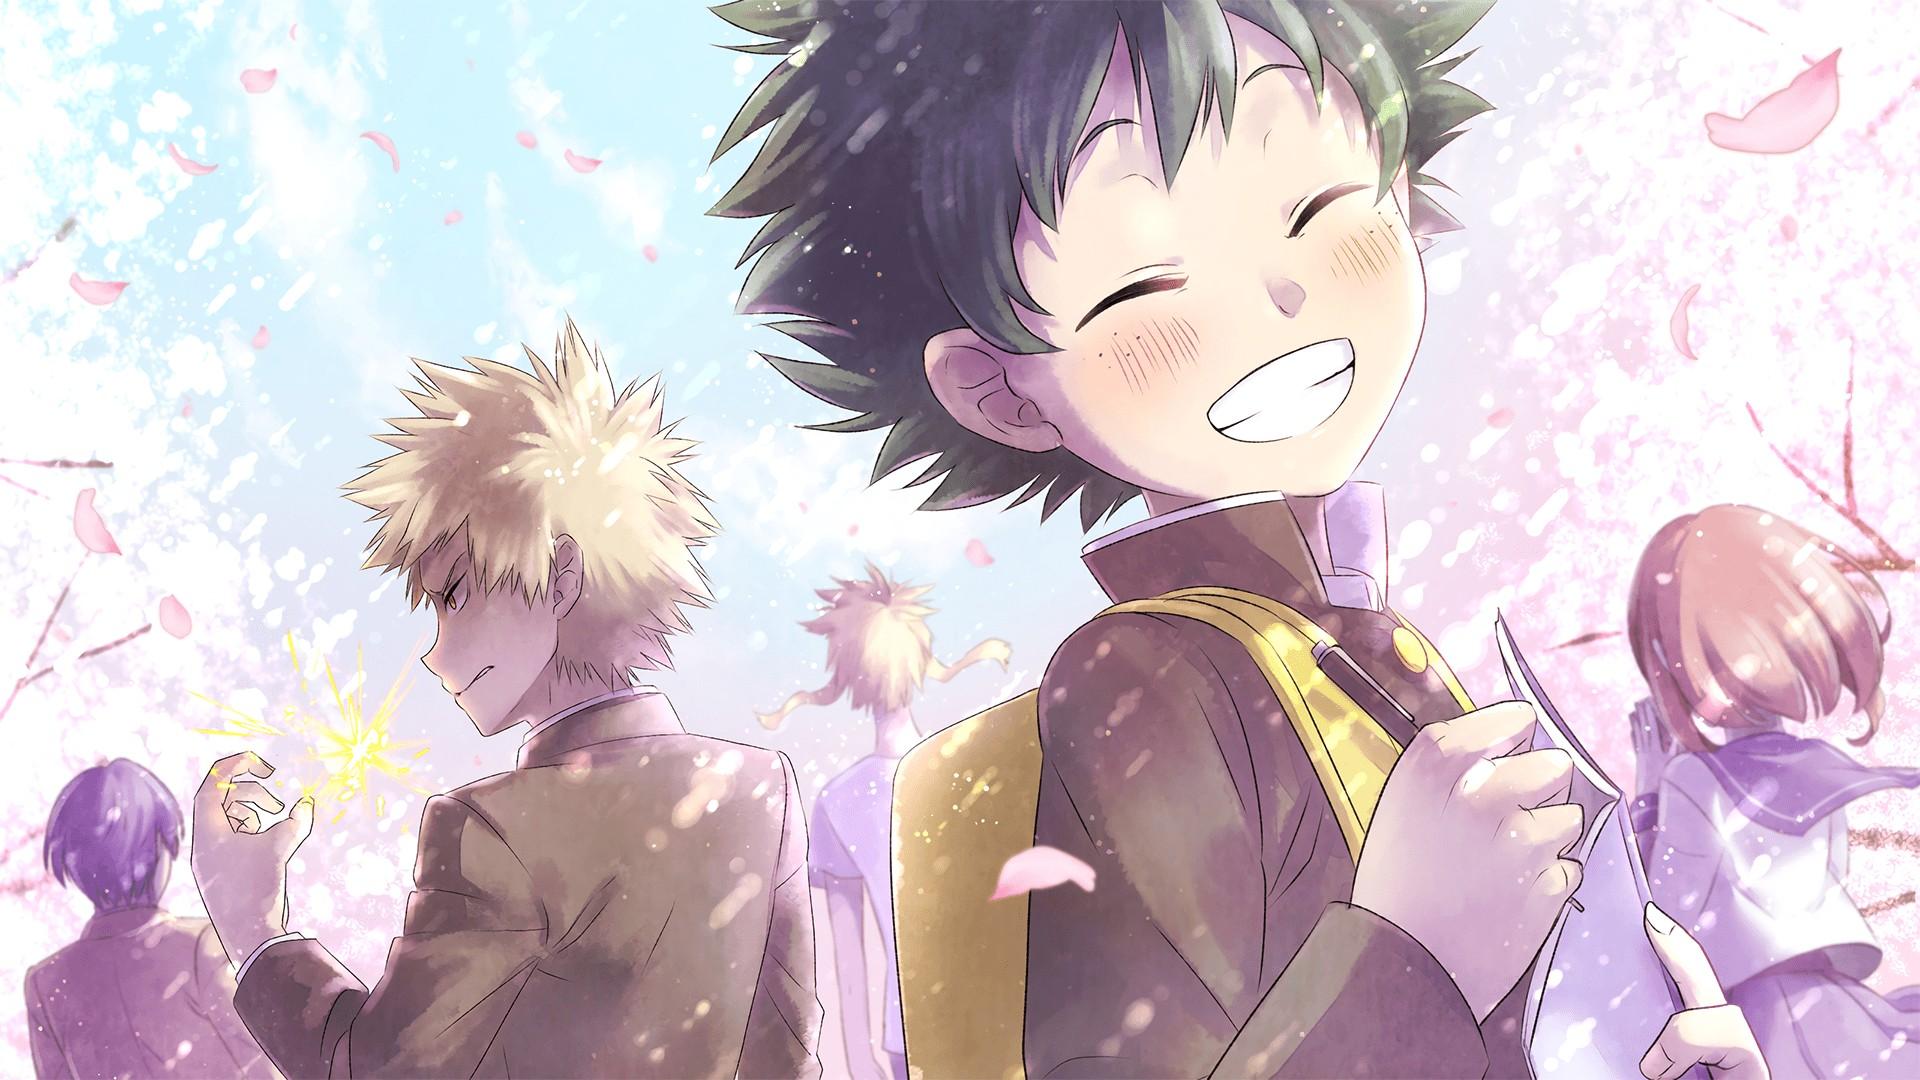 Do you want my hero academia wallpapers? My Hero Academia Anime Wallpaper HD | 2021 Movie Poster ...